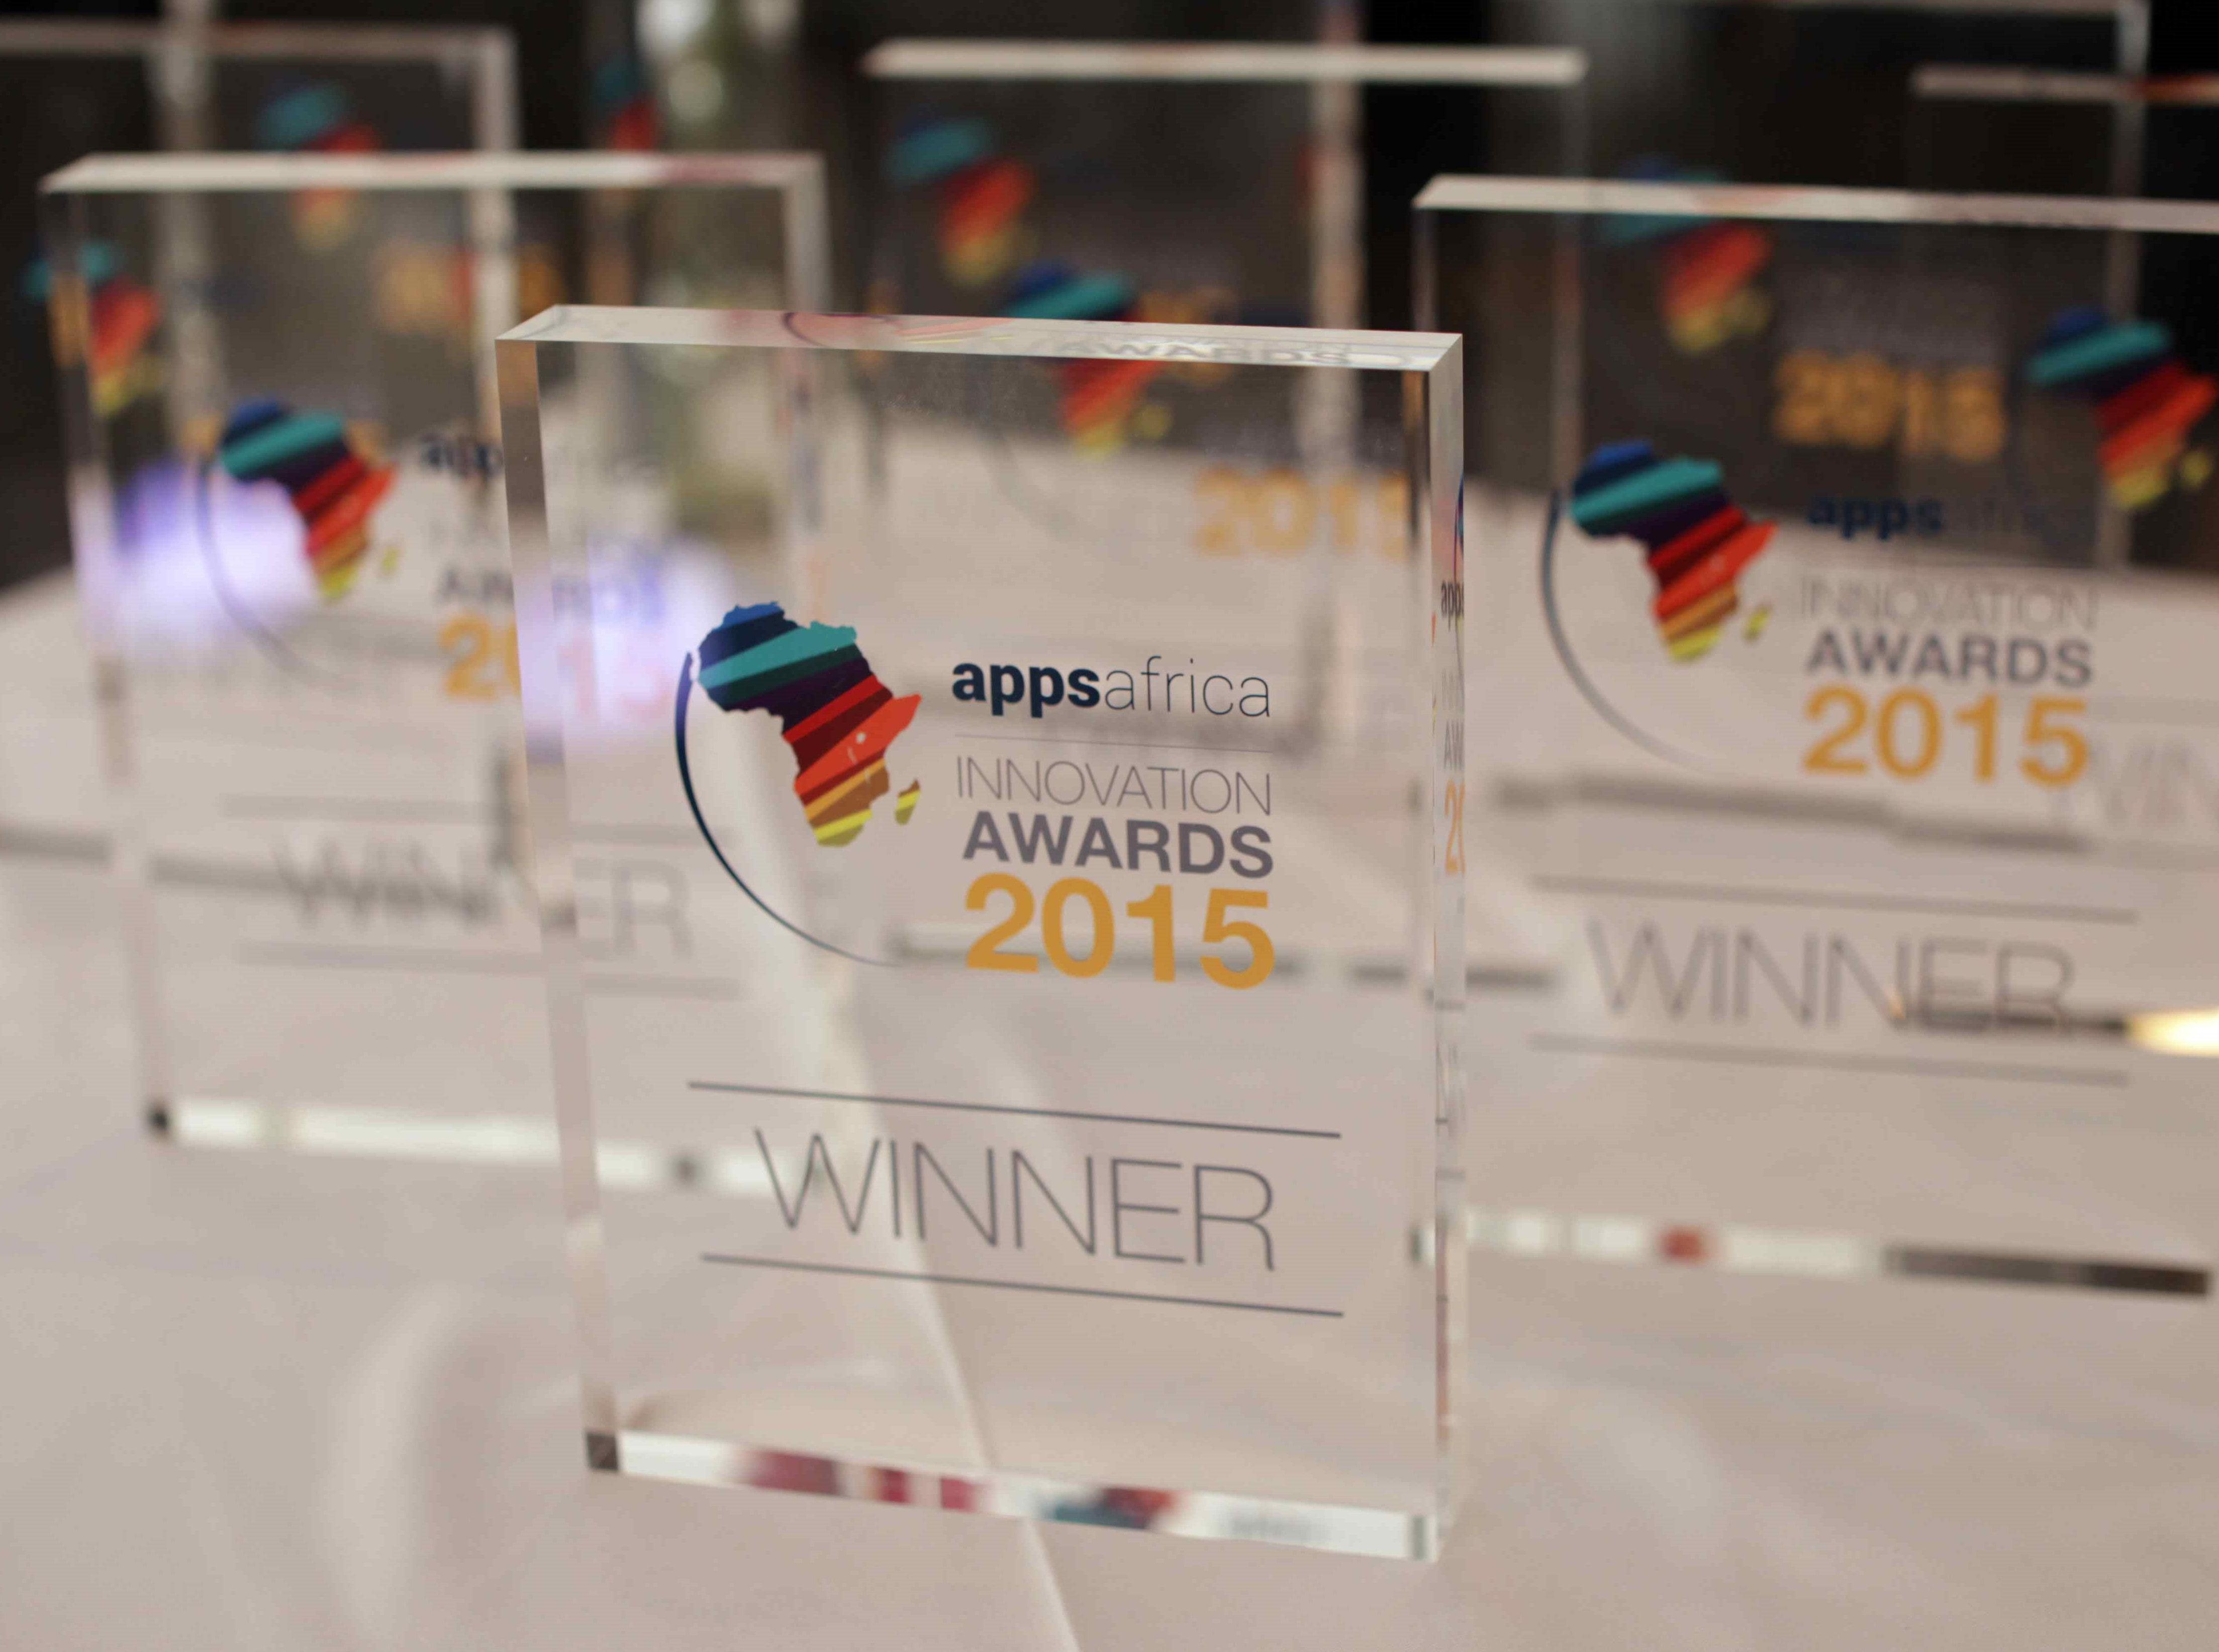 winners awards